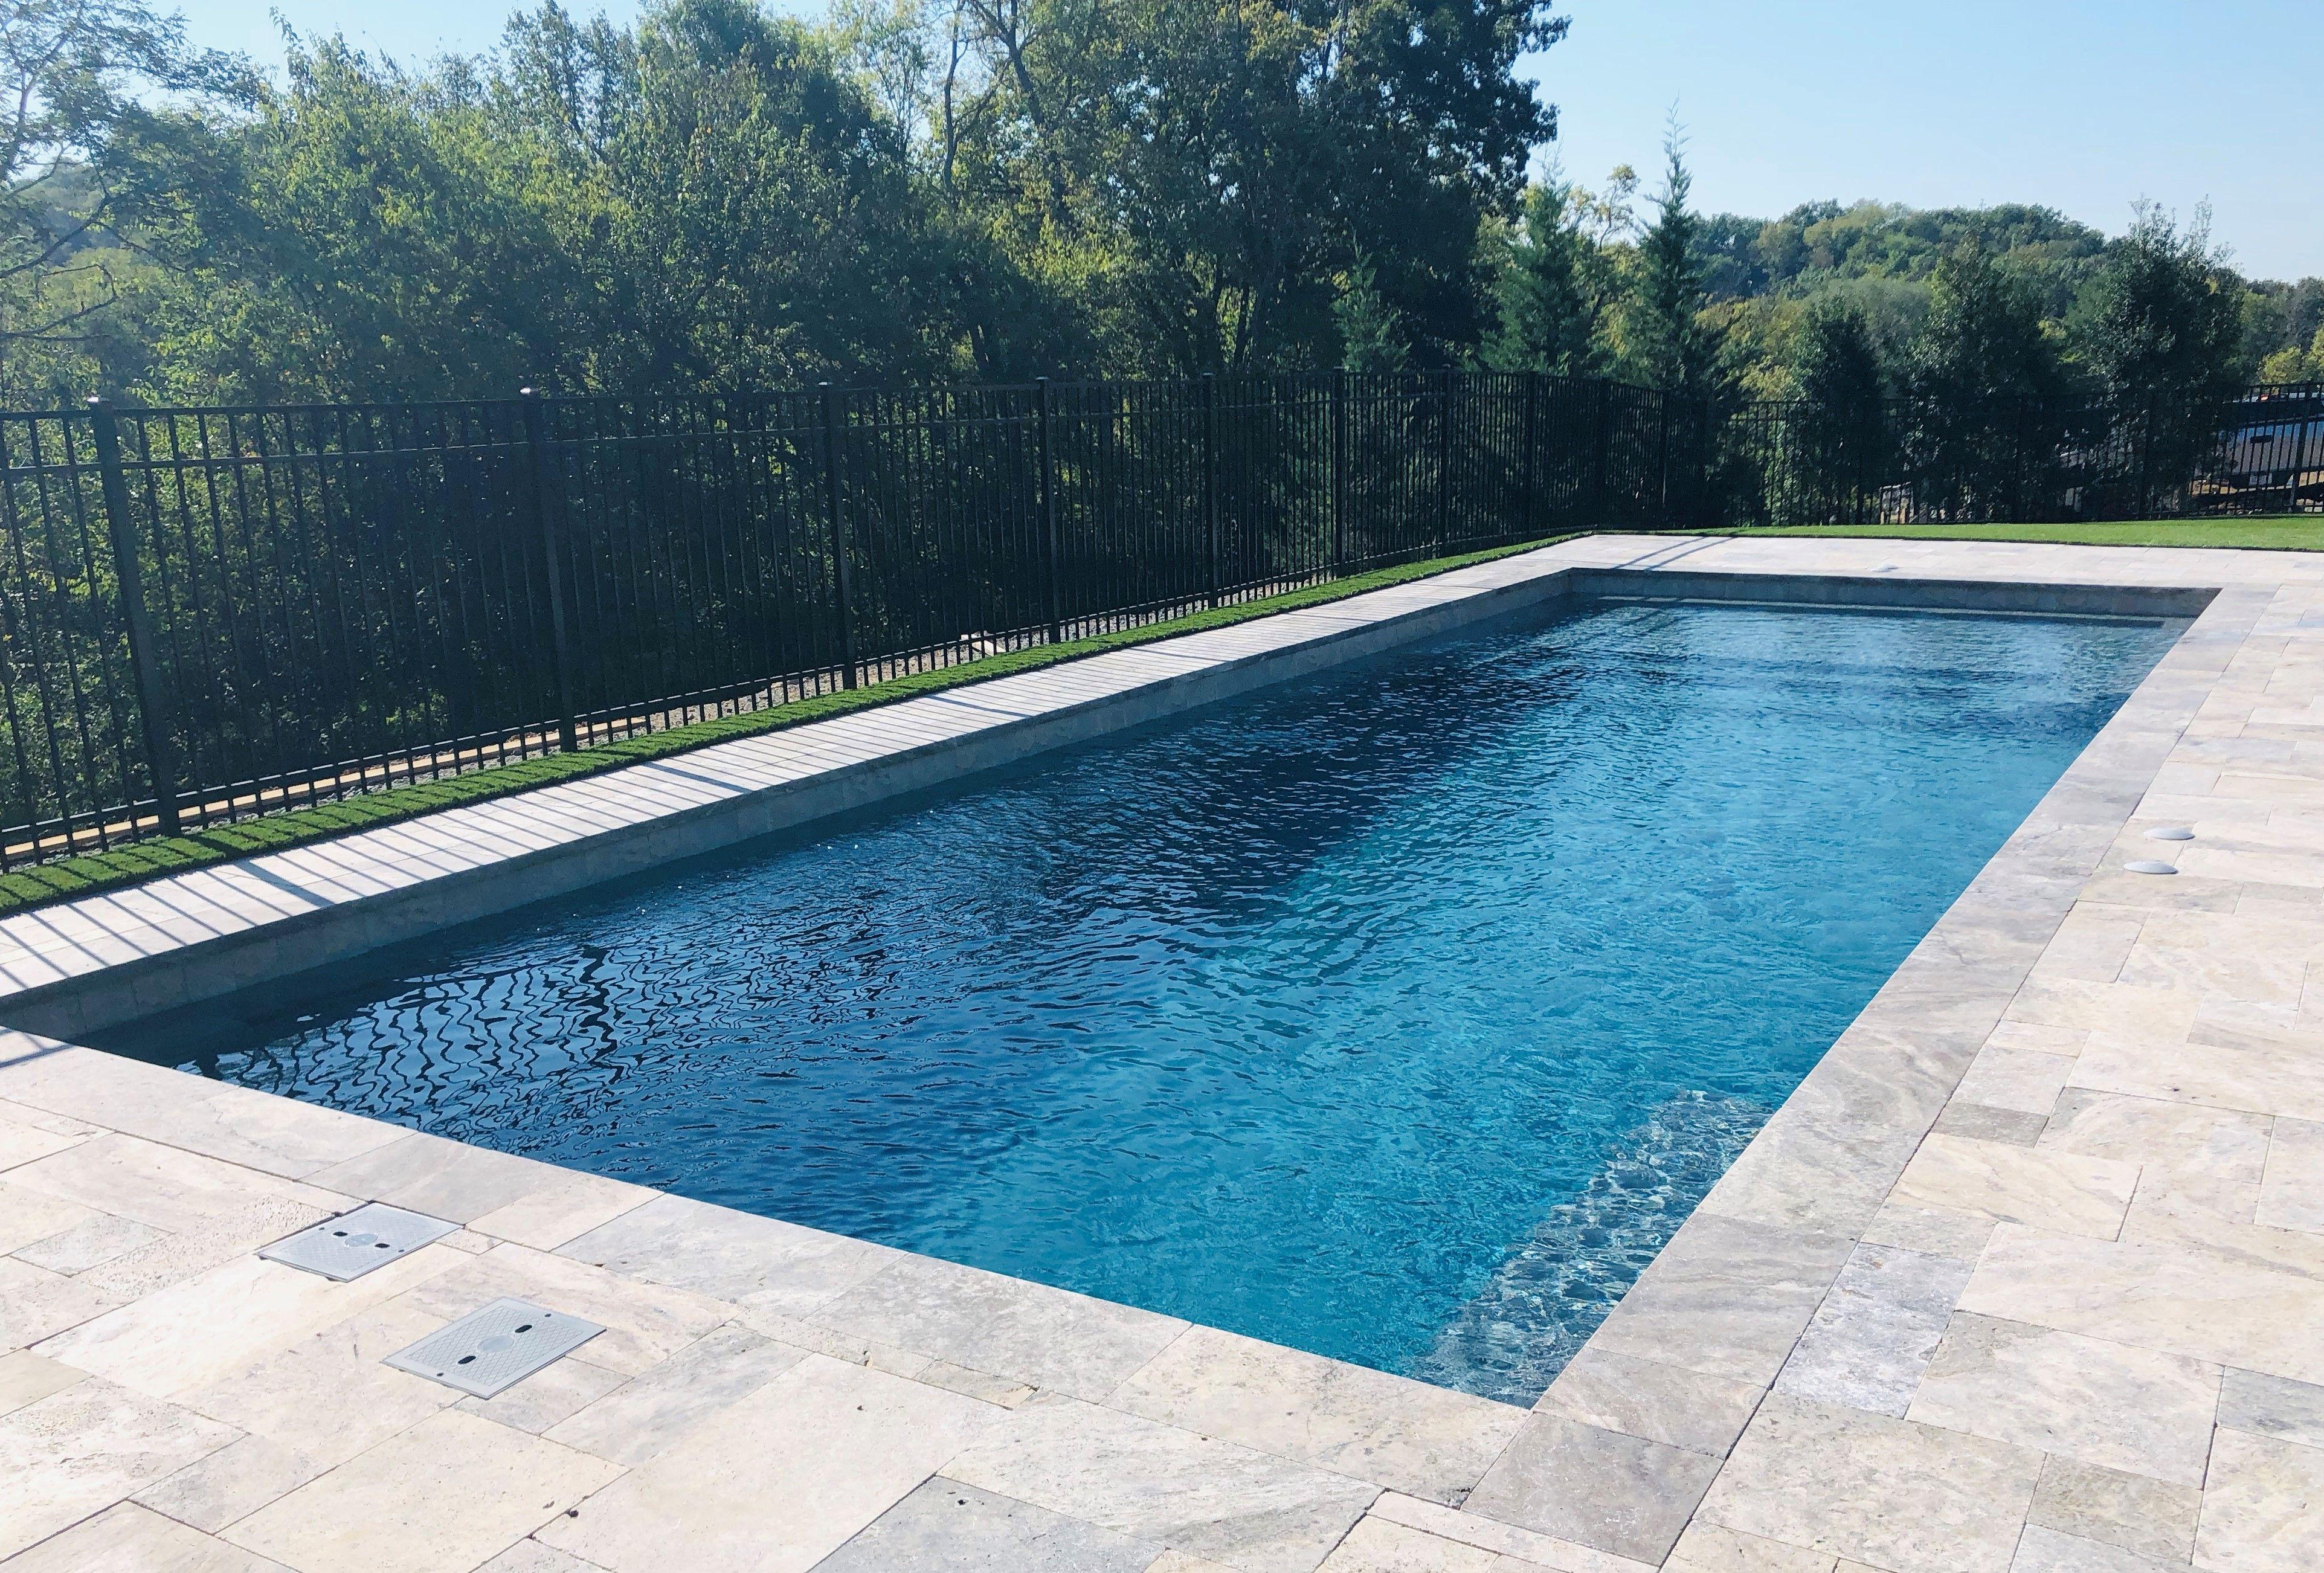 Imagine Pools The Illusion Swimming Pool House Swimming Pools Pool